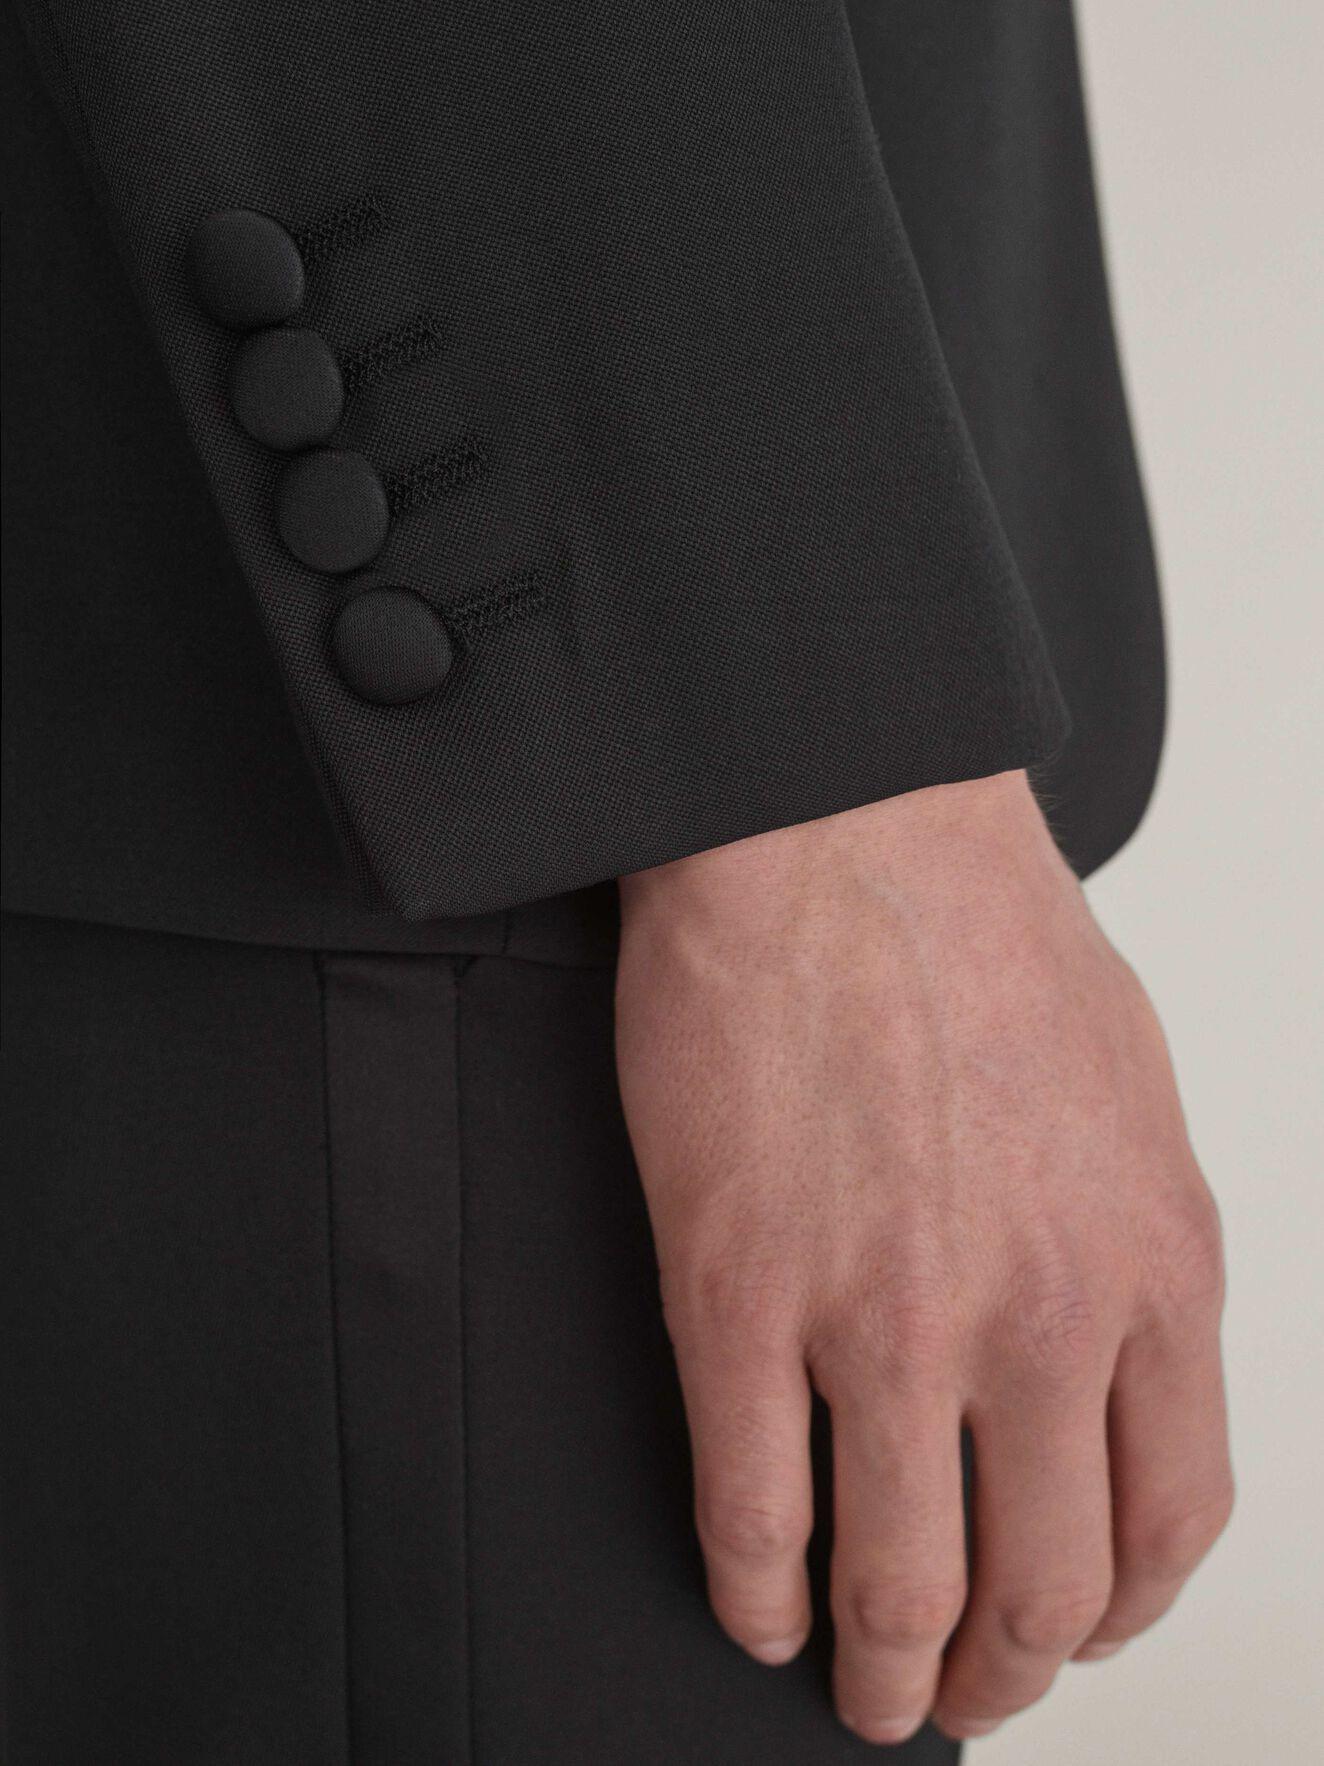 1903 Tuxedo Blazer in Black from Tiger of Sweden